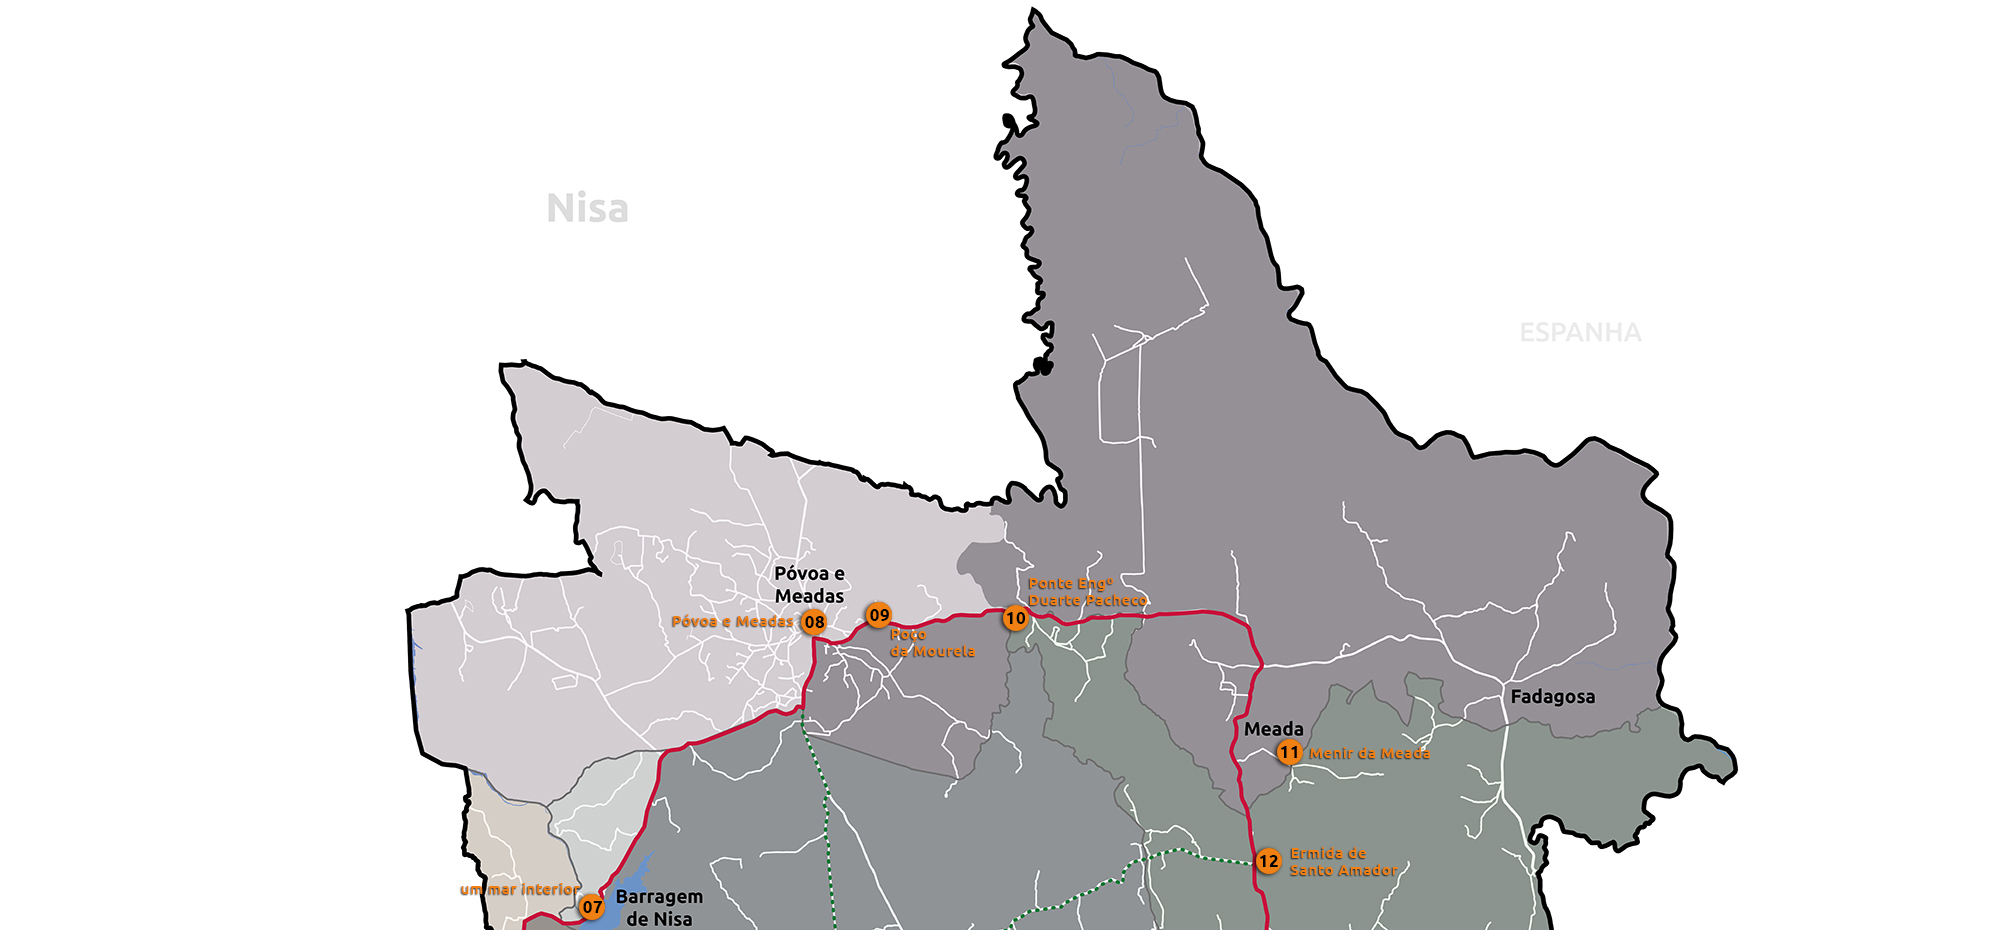 mapa_aumentado_2000x930_cvide_141014-01